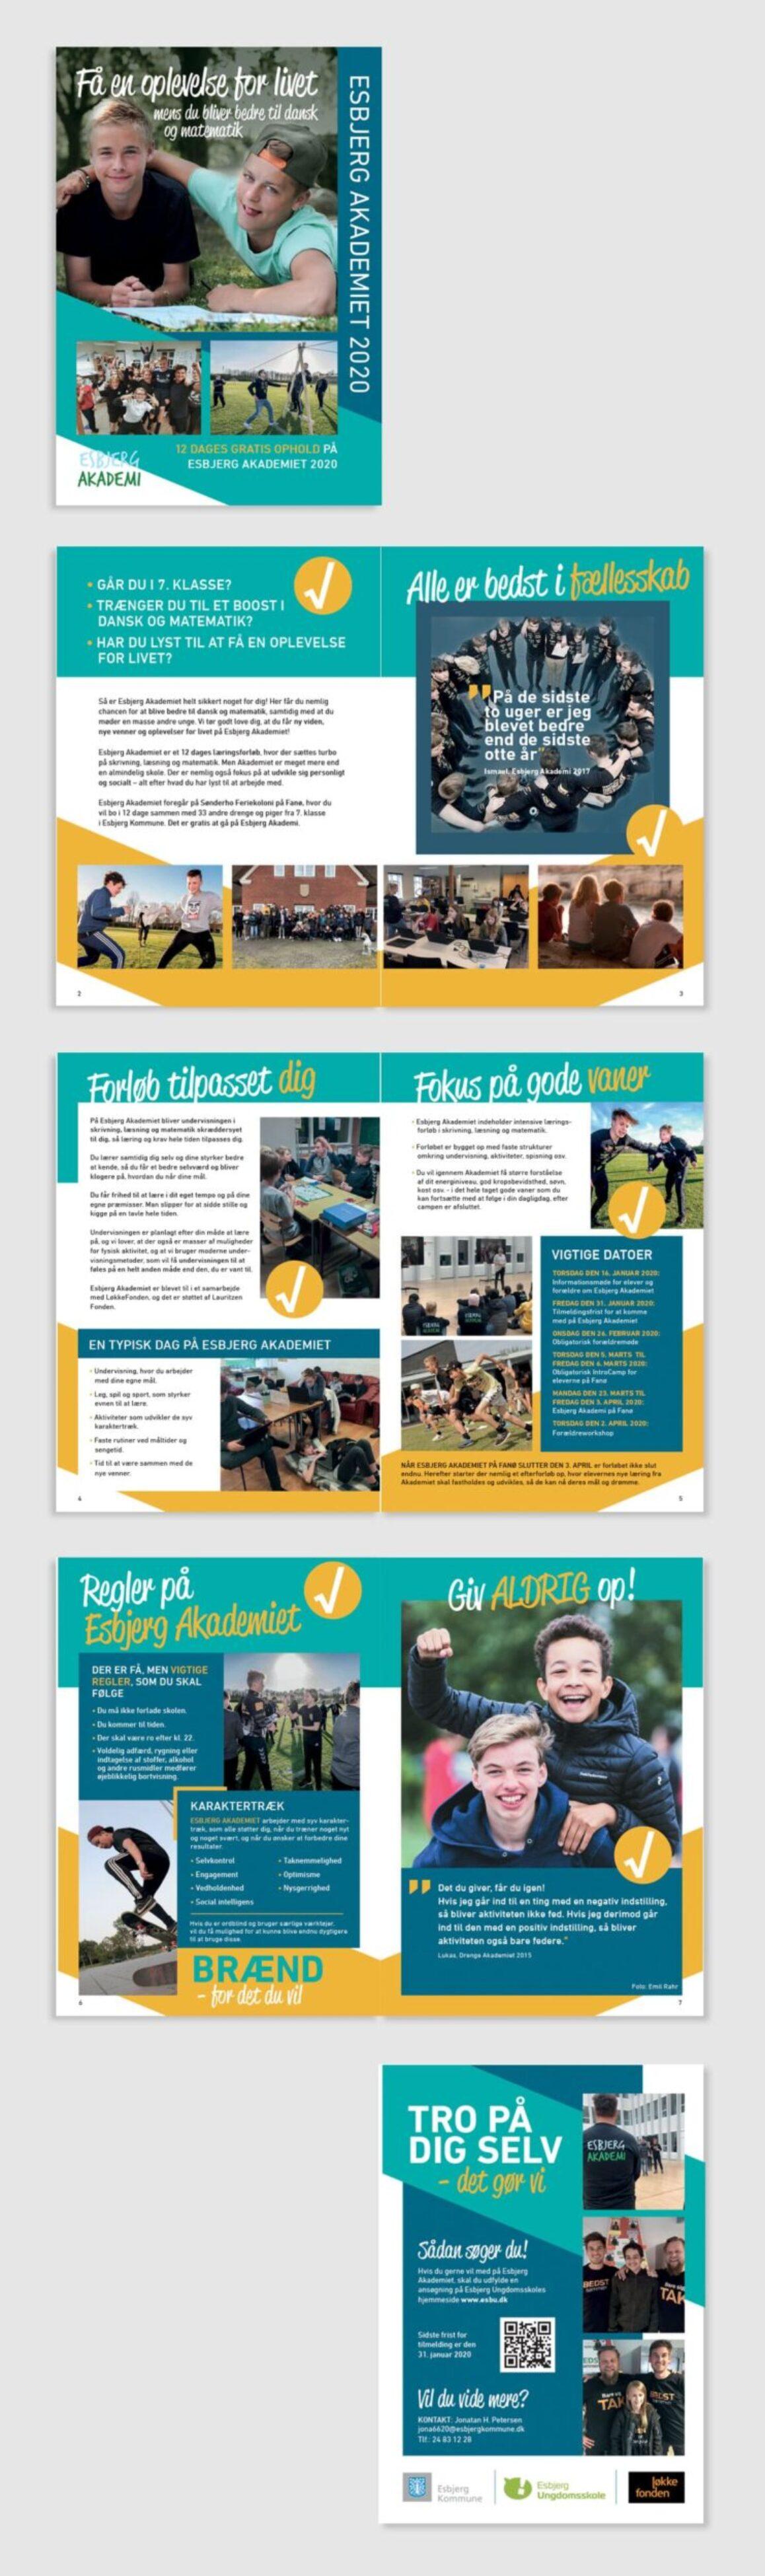 Esbjerg-Akademi-Løkke-fonden-Esbjerg-kommune-Esbjerg-Ungdomsskole-3-Linda-Kongerslev-Grafisk-Design-folder.jpg